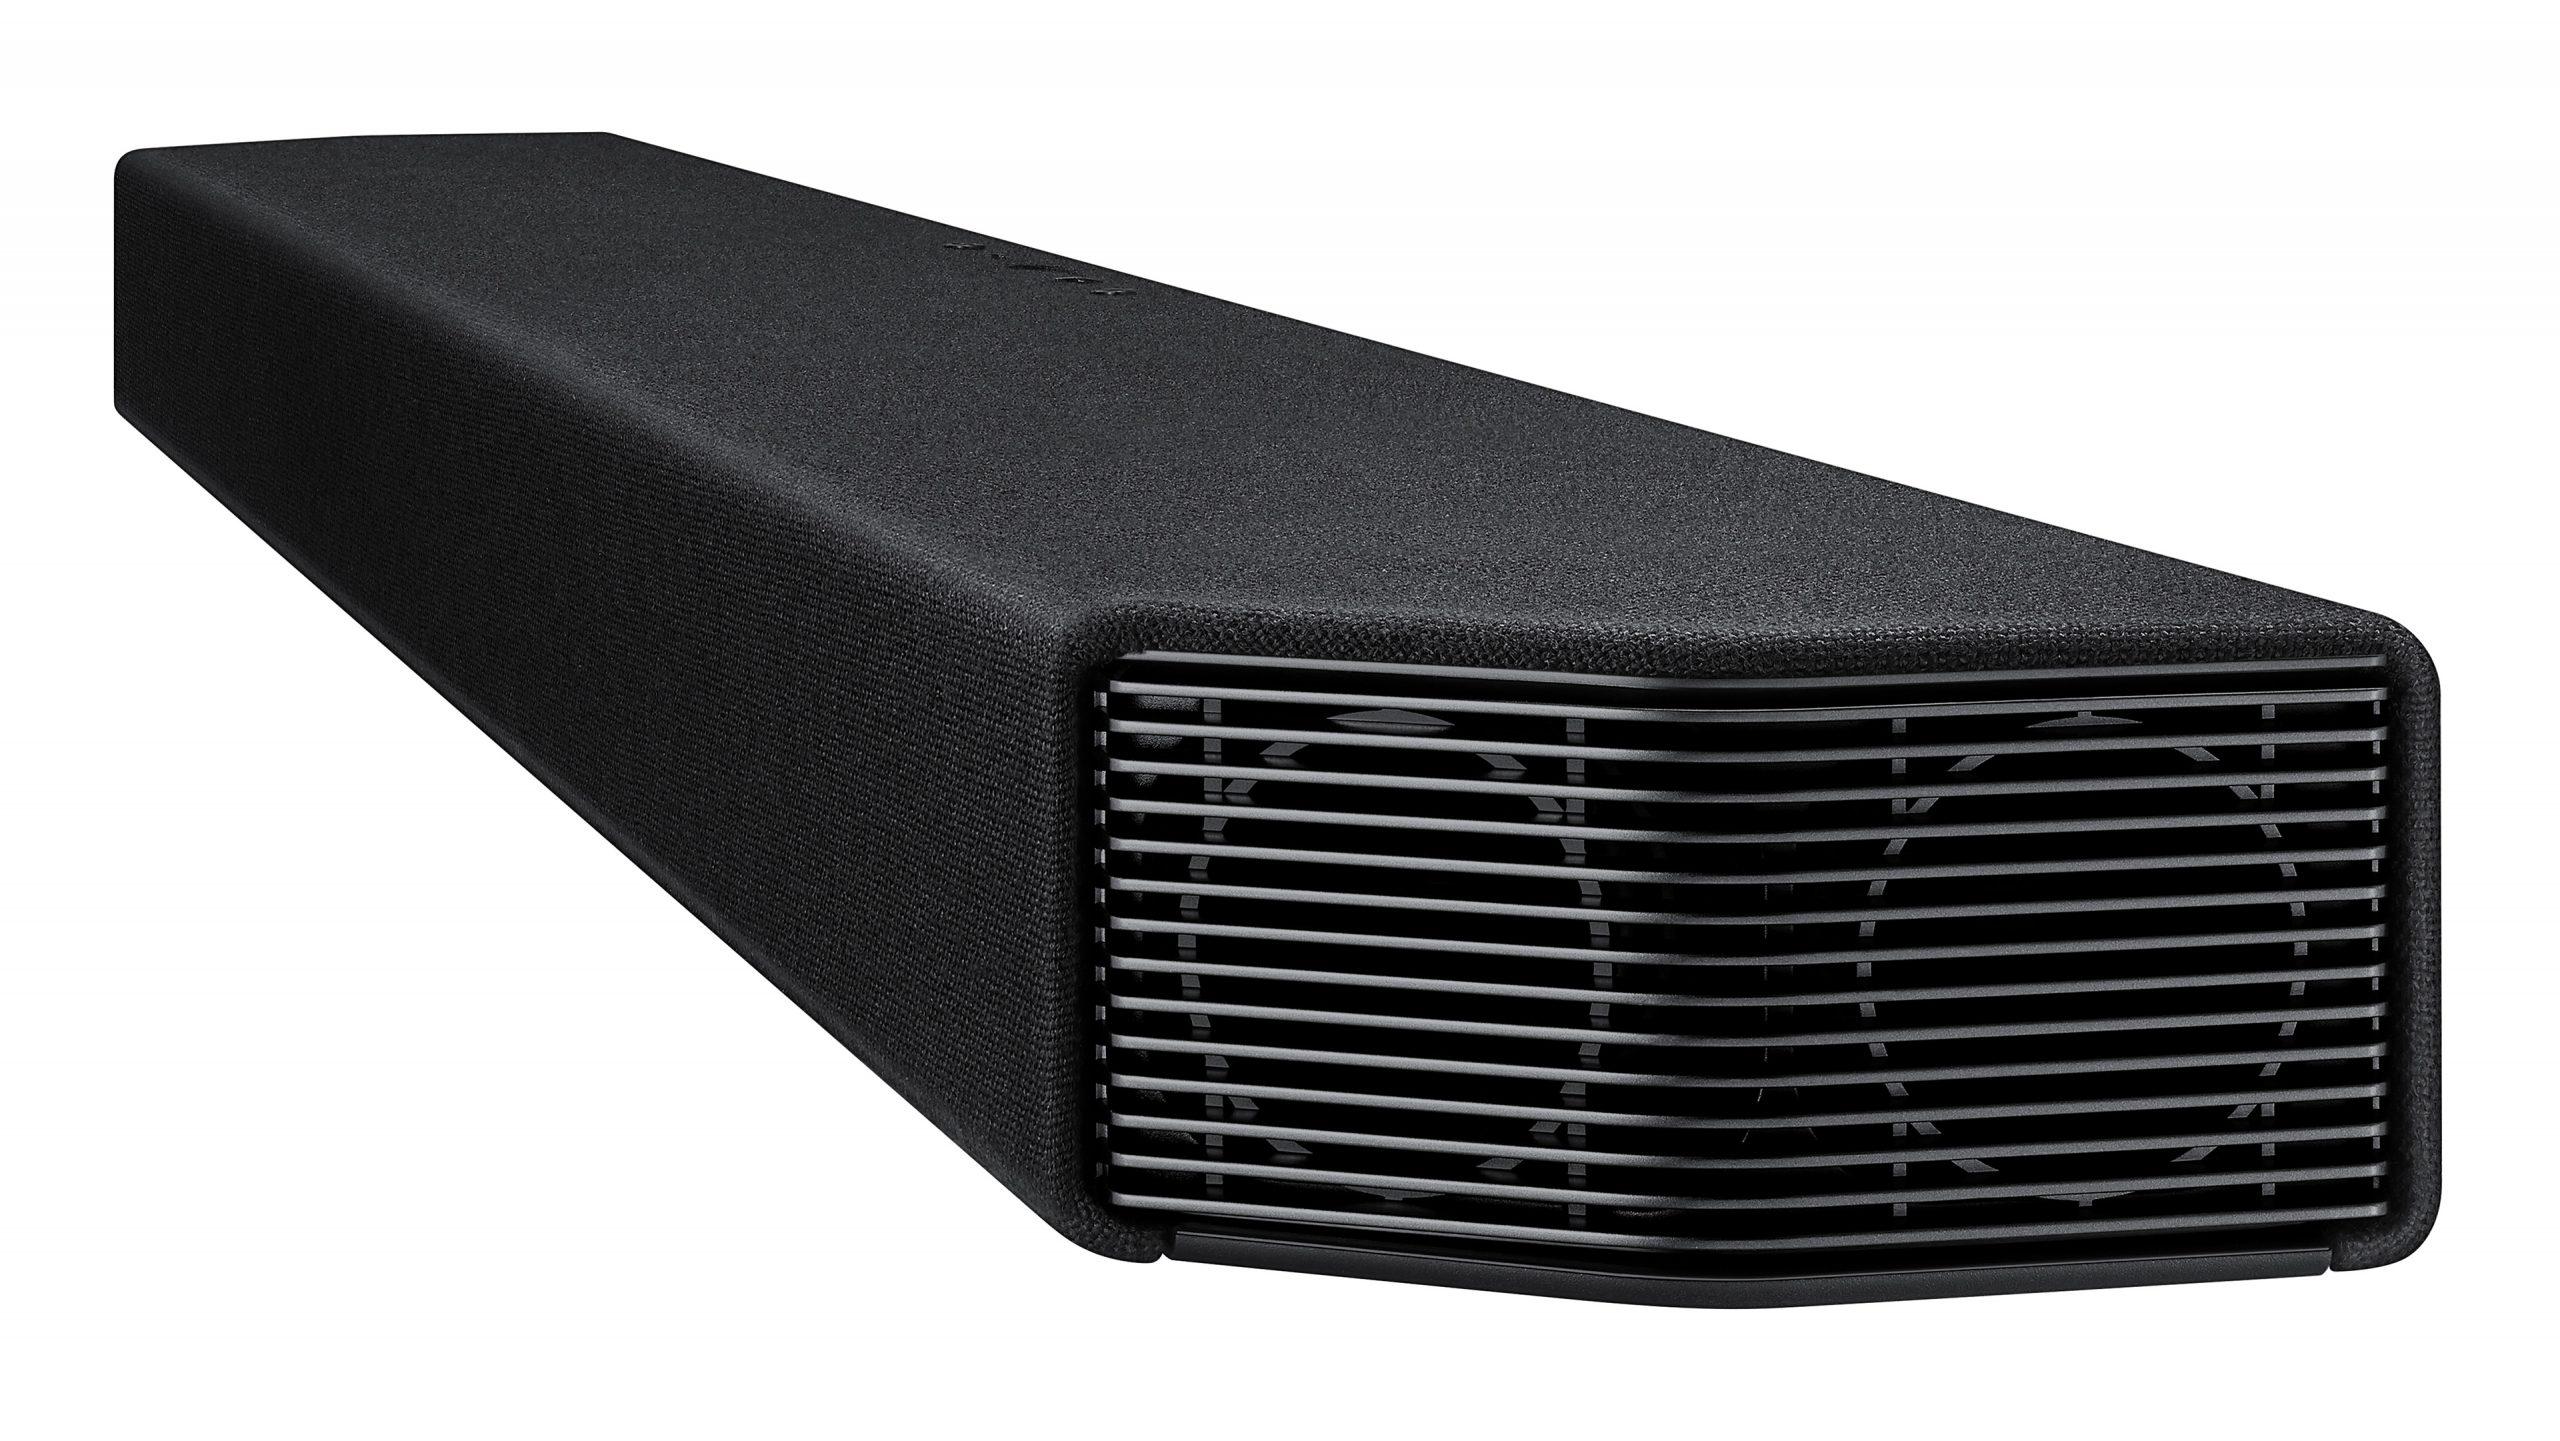 Samsung HW-Q950T side speakers